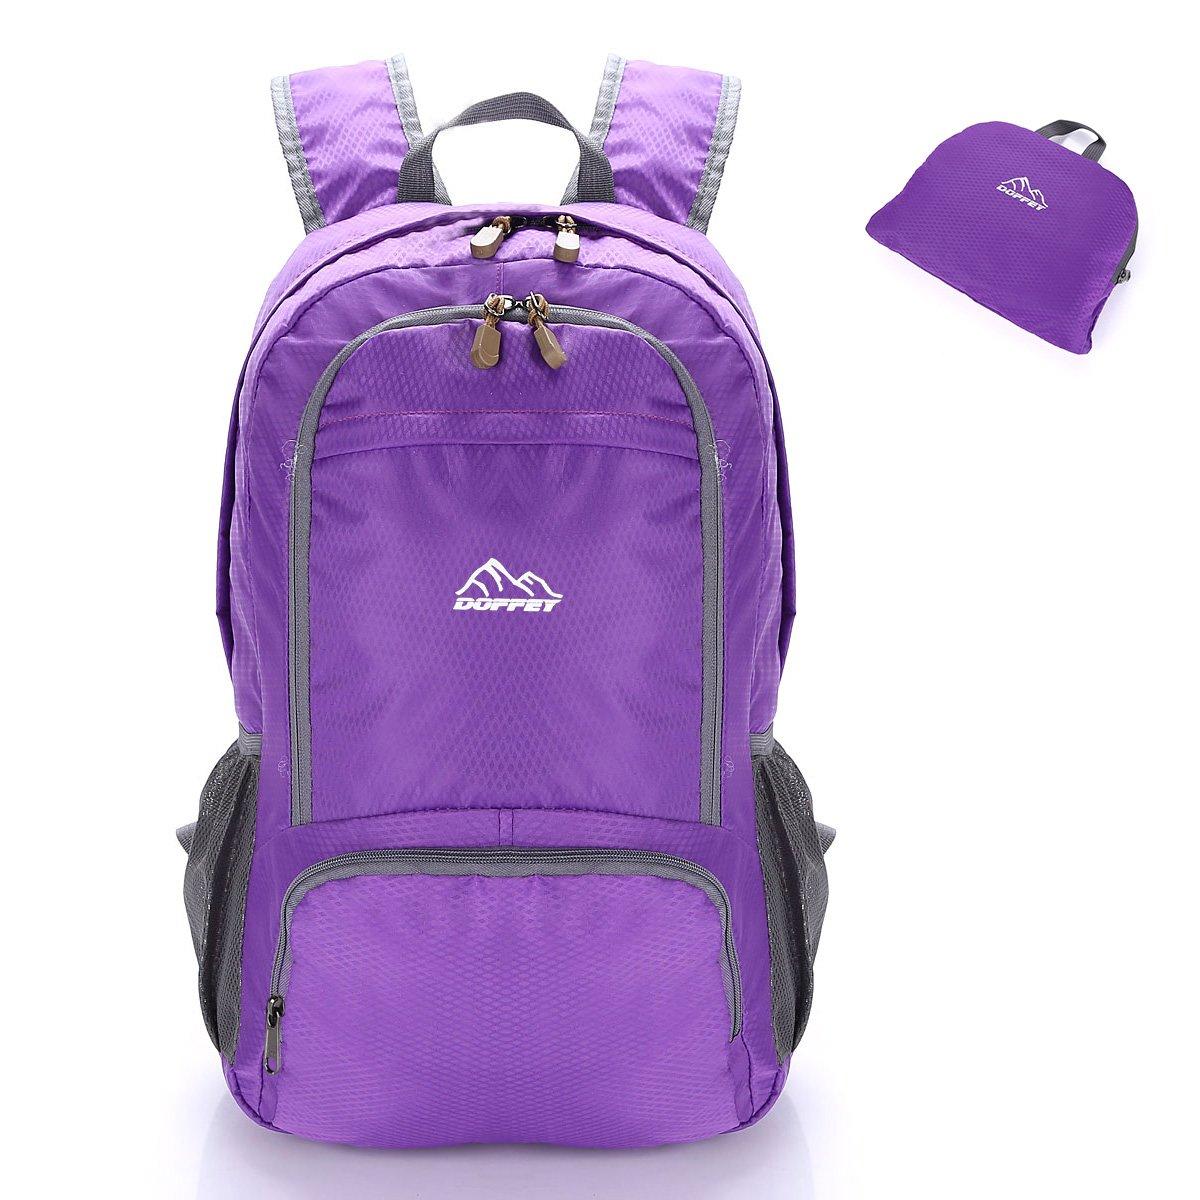 Doffey Lightweight Backpack, 25L Waterproof Packable Travel Hiking Backpack